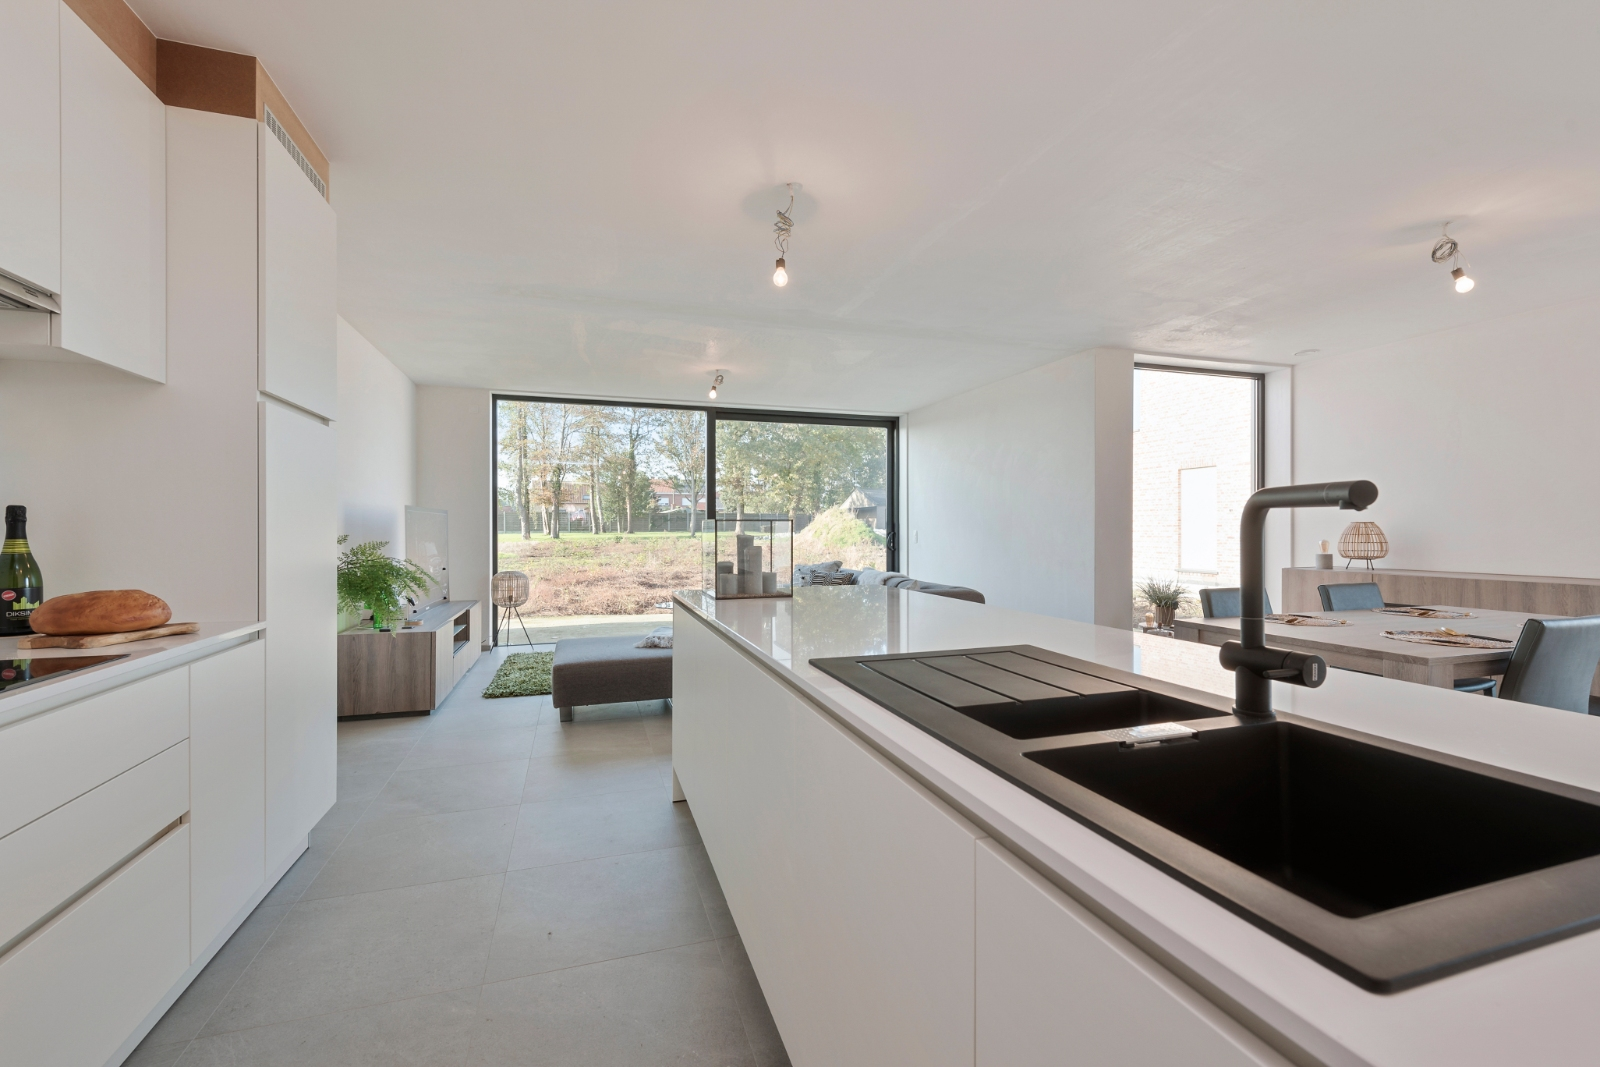 Prachtige moderne nieuwbouwwoning nabij centrum Esen - 10